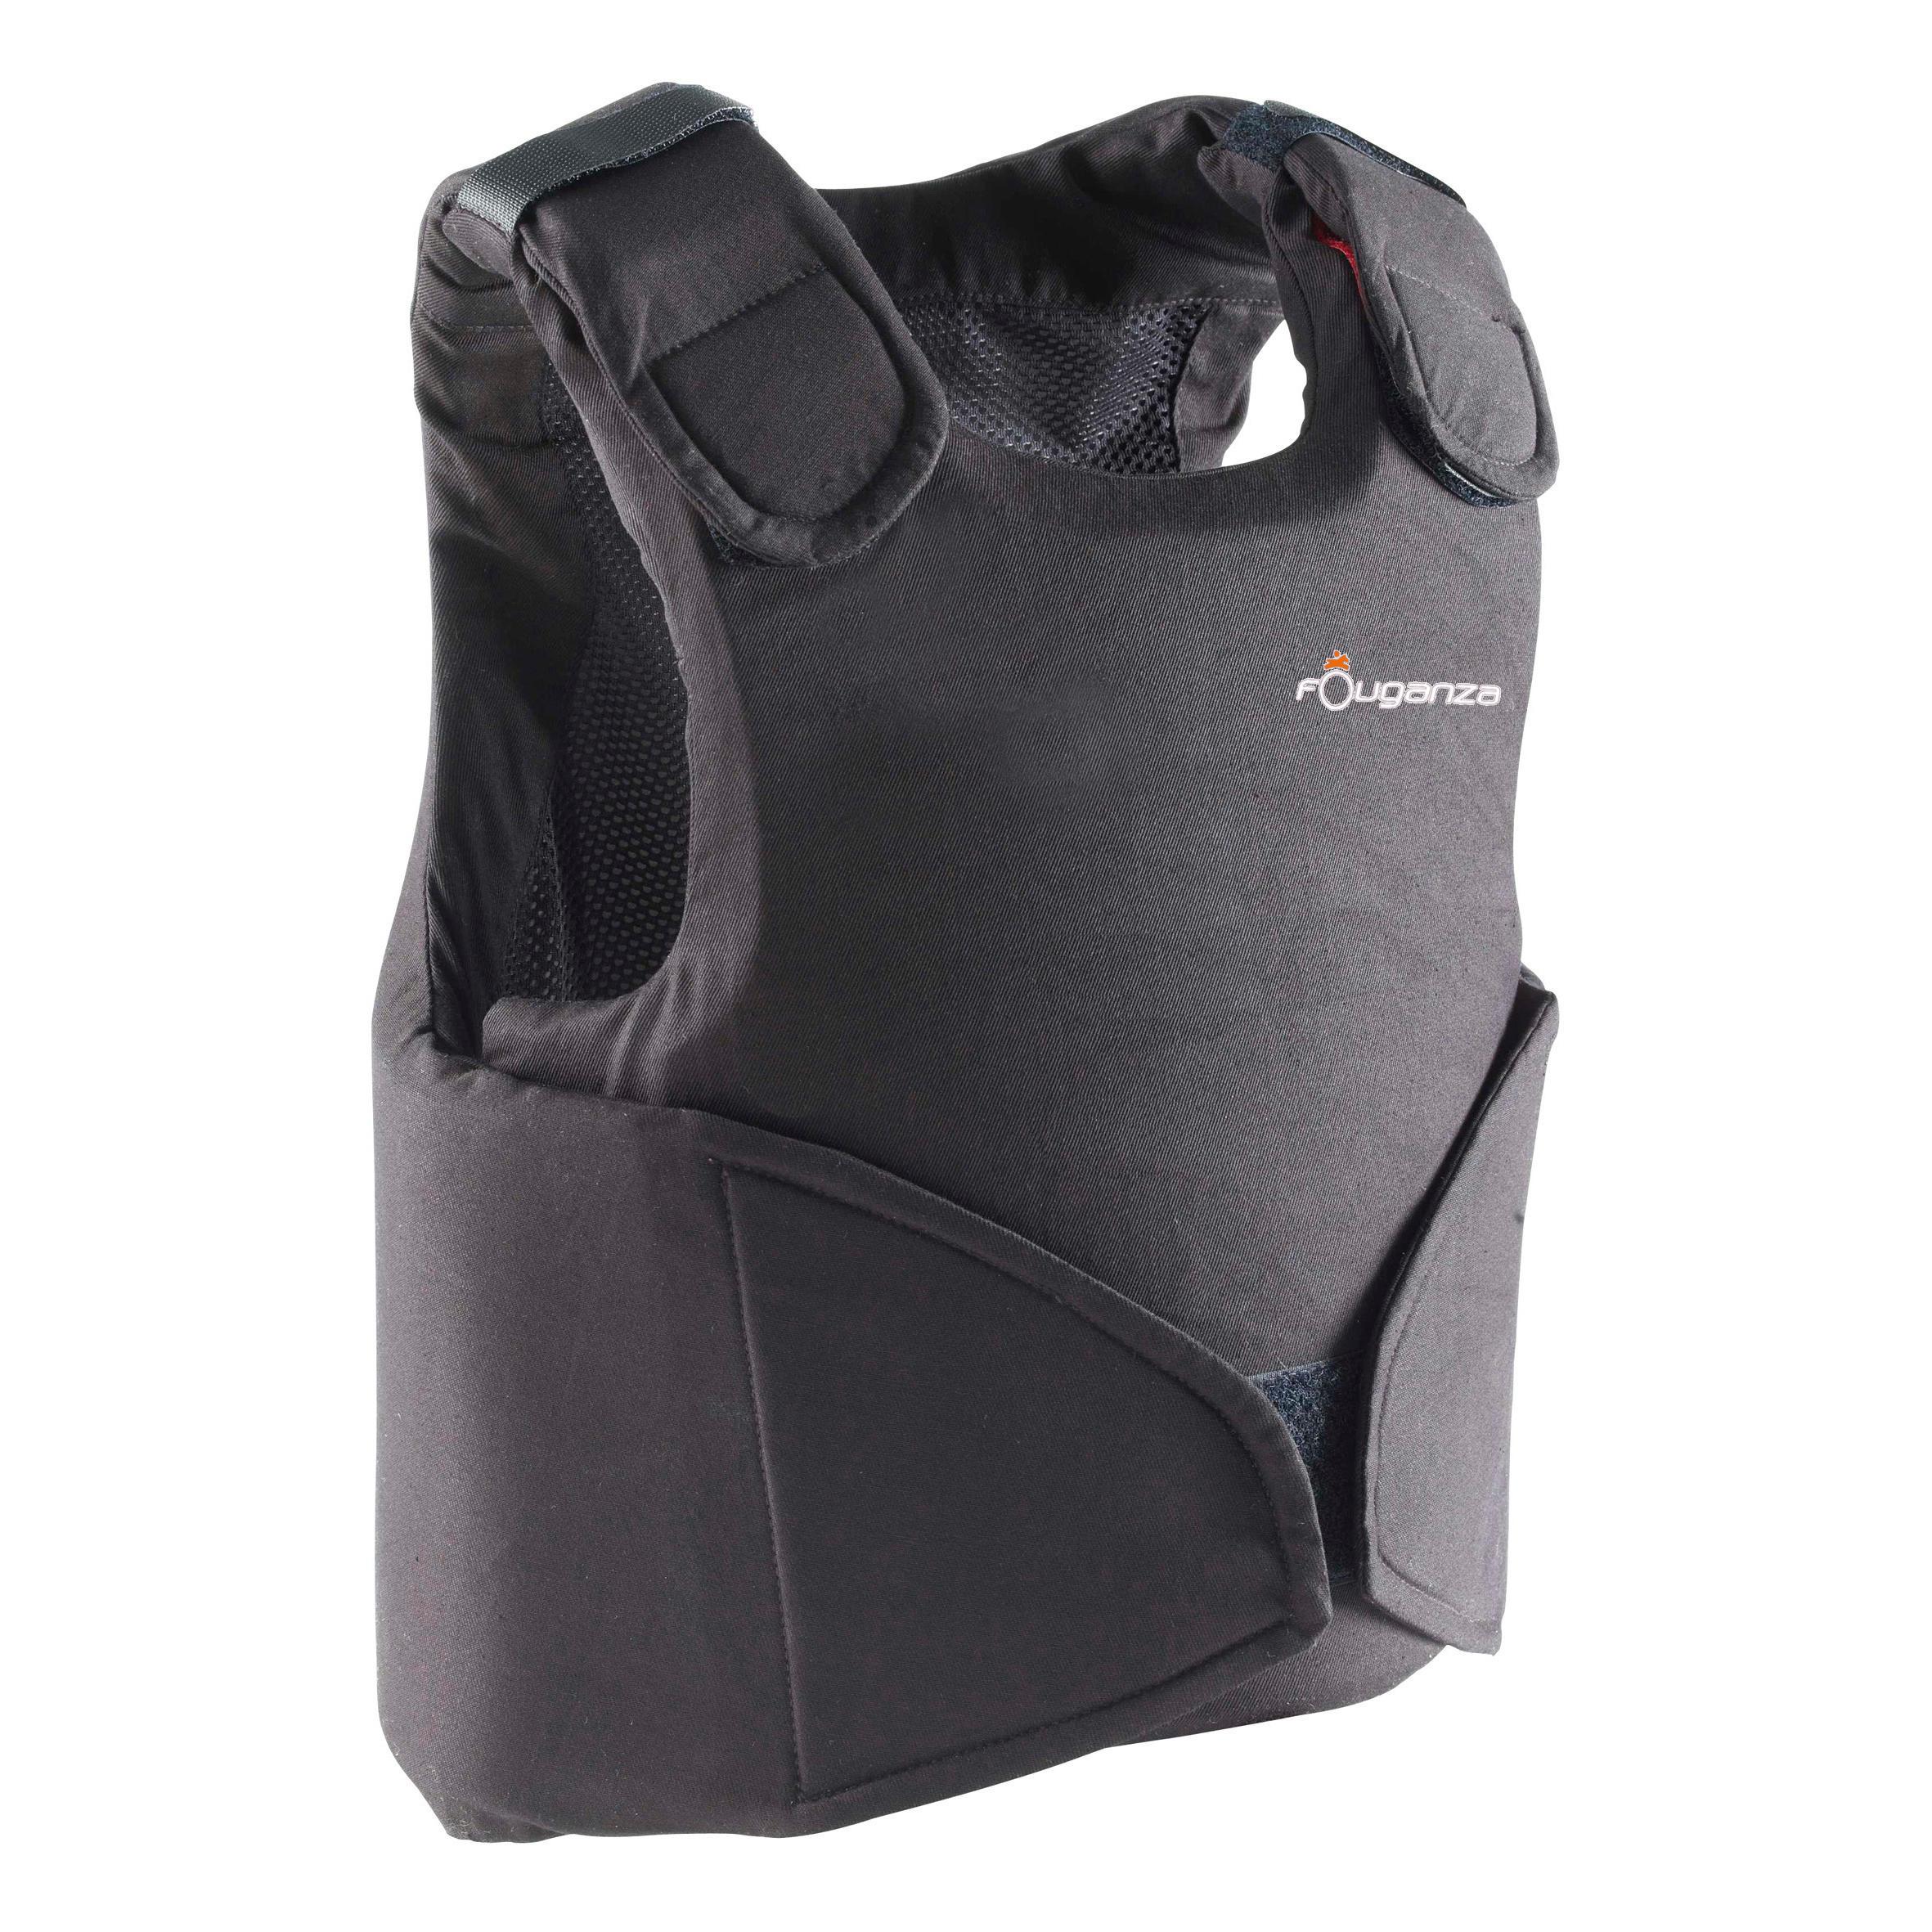 Fouganza Bodyprotector Safety 100 voor kinderen, ruitersport thumbnail